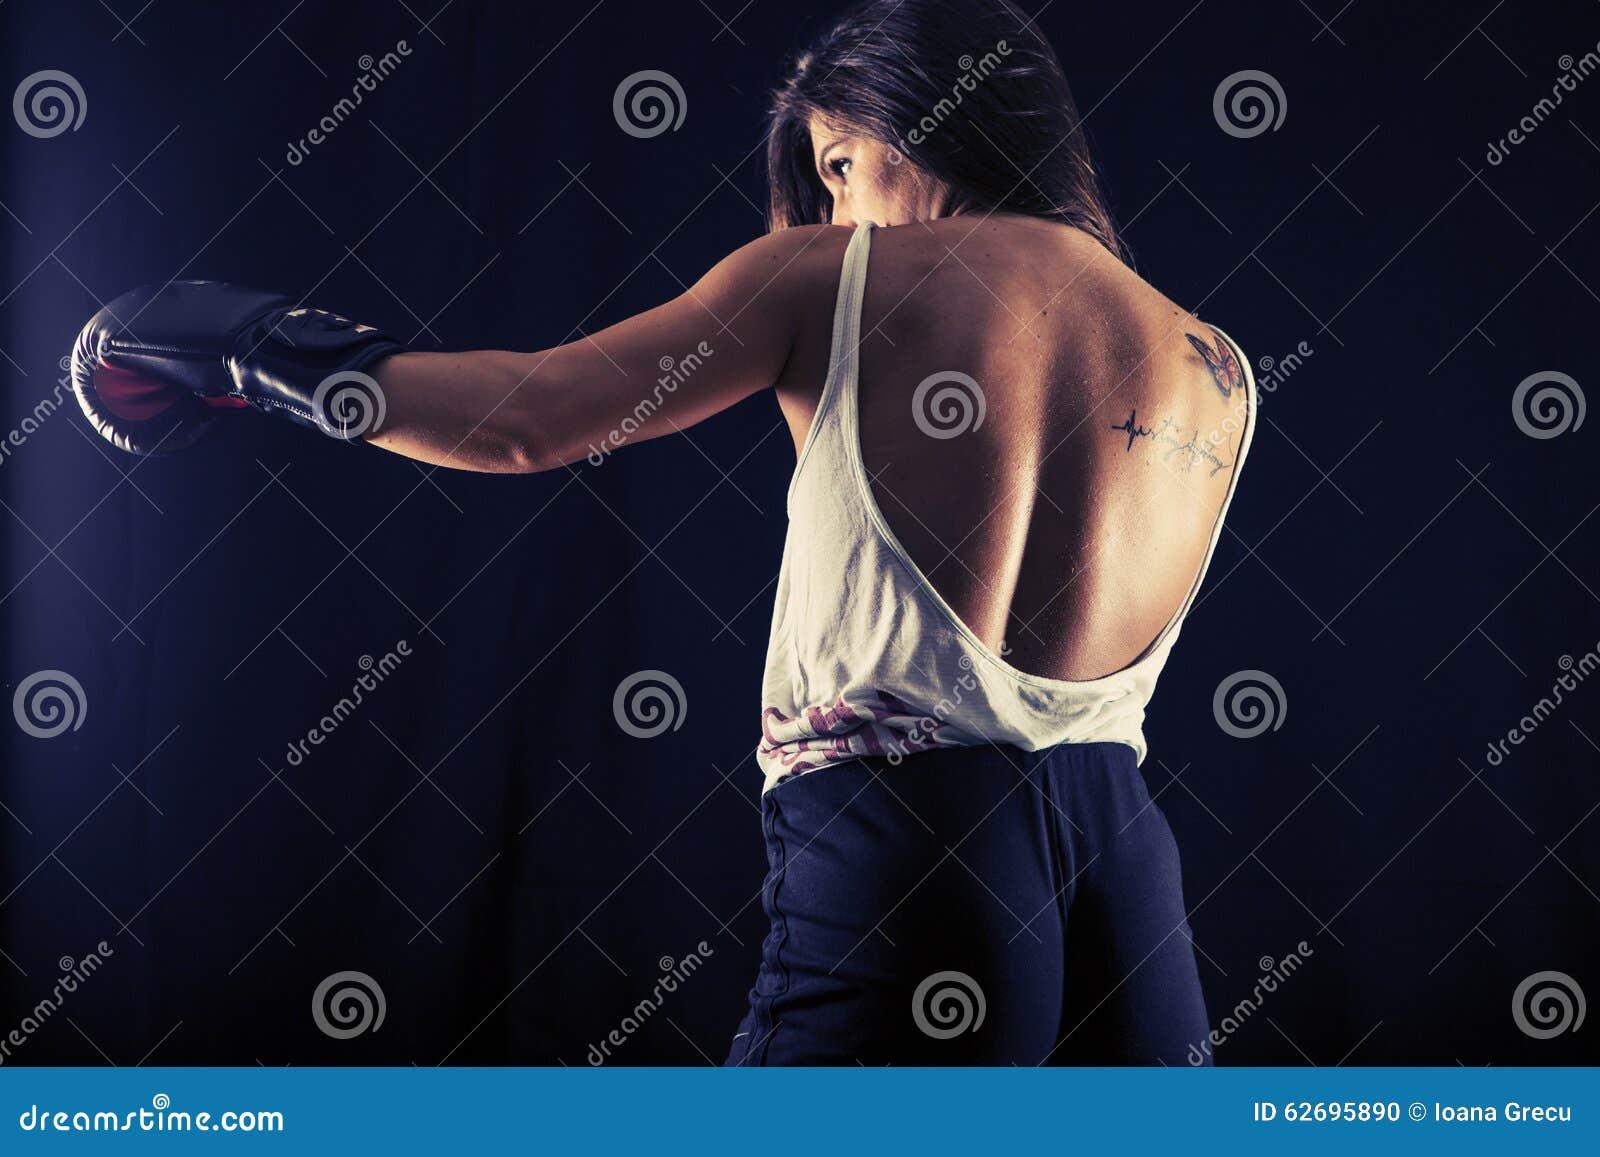 Strong young woman boxing performing a jab kick